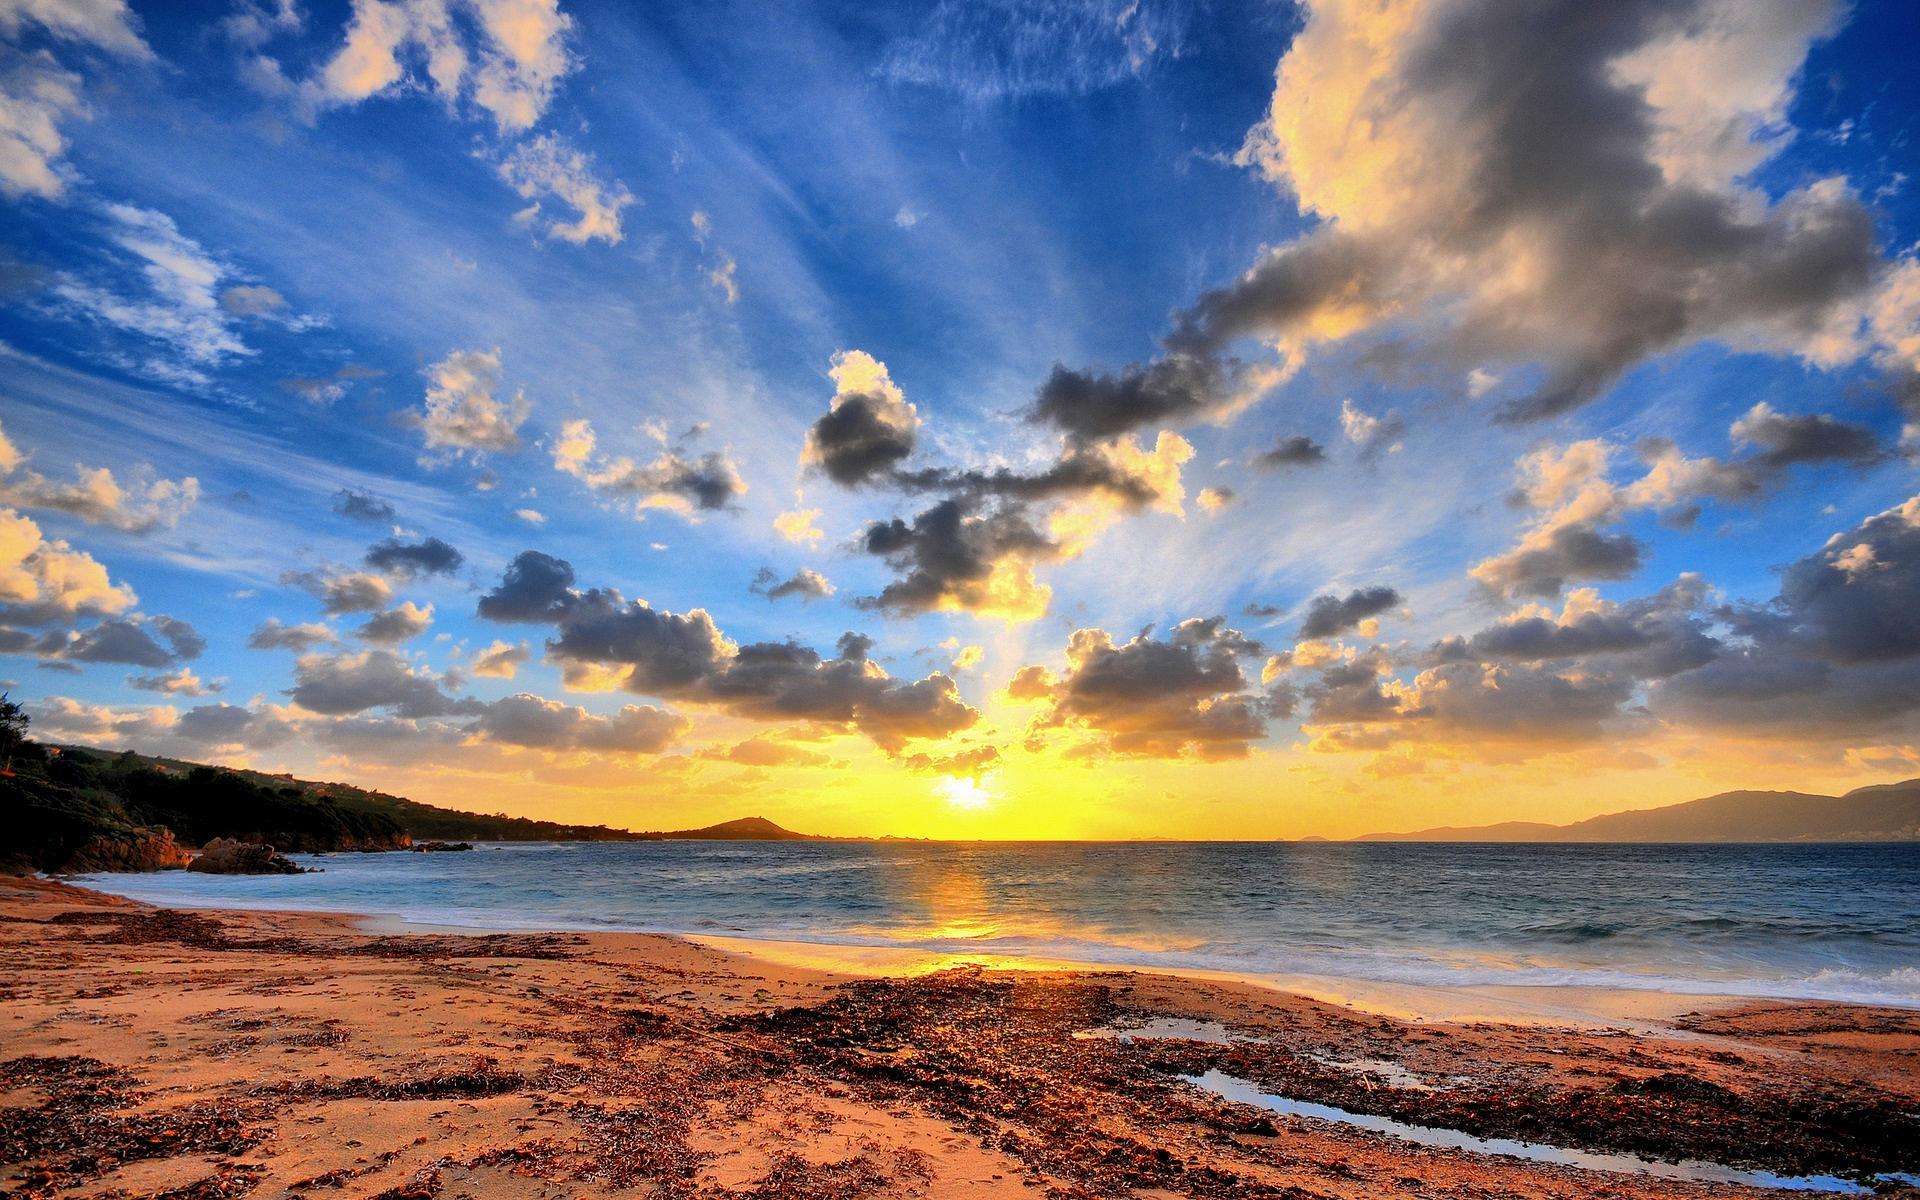 Пейзажи пляж берег вода небо солнце